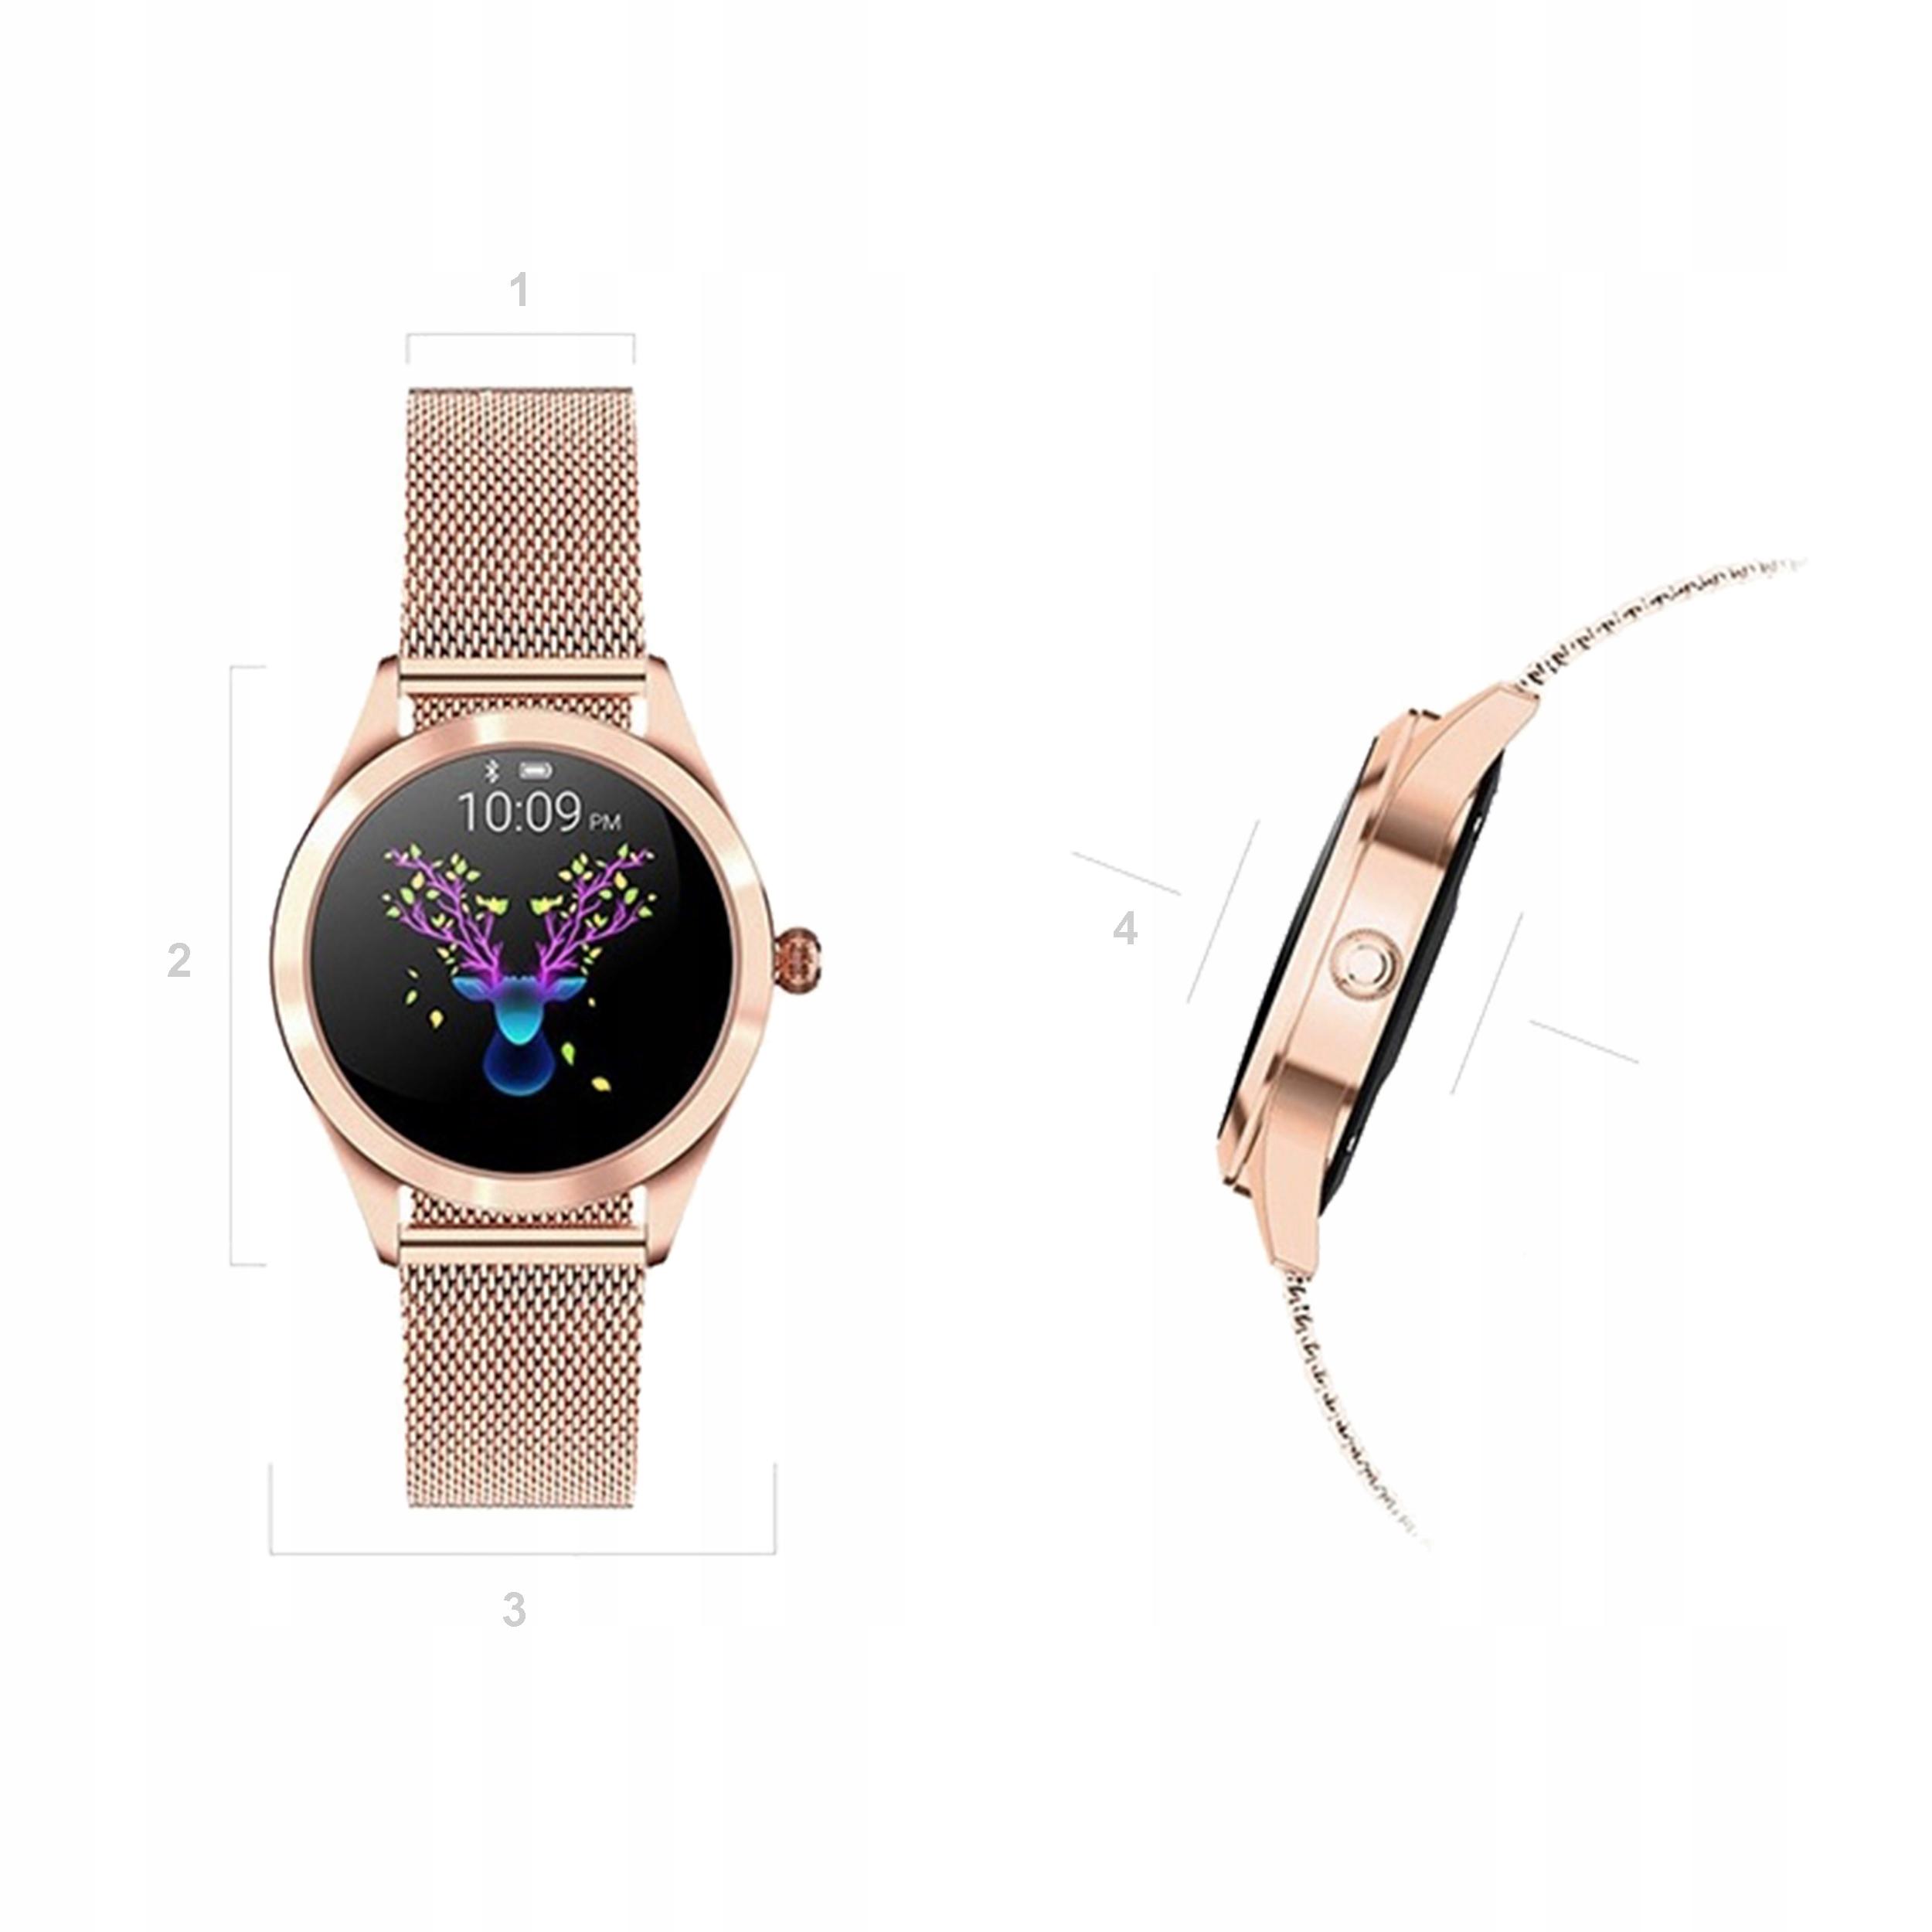 Kvinners smartklokke KW10 OLED DESIGN trinn pulssyklus Veske materiale annet metall